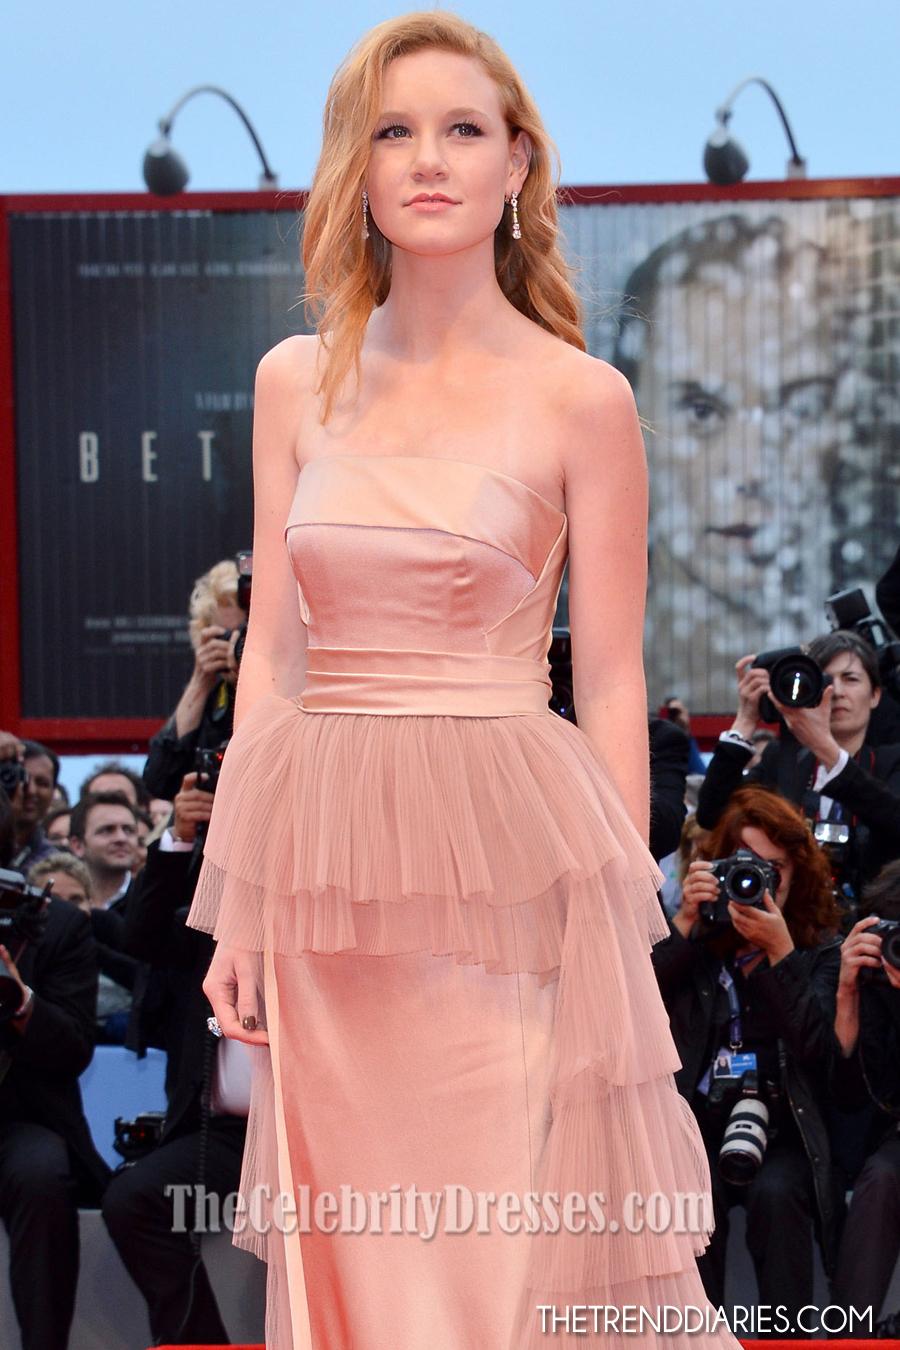 Madisen Beaty Strapless Formal Dress 2012 Venice Film Festival Red Carpet Gown - TheCelebrityDresses